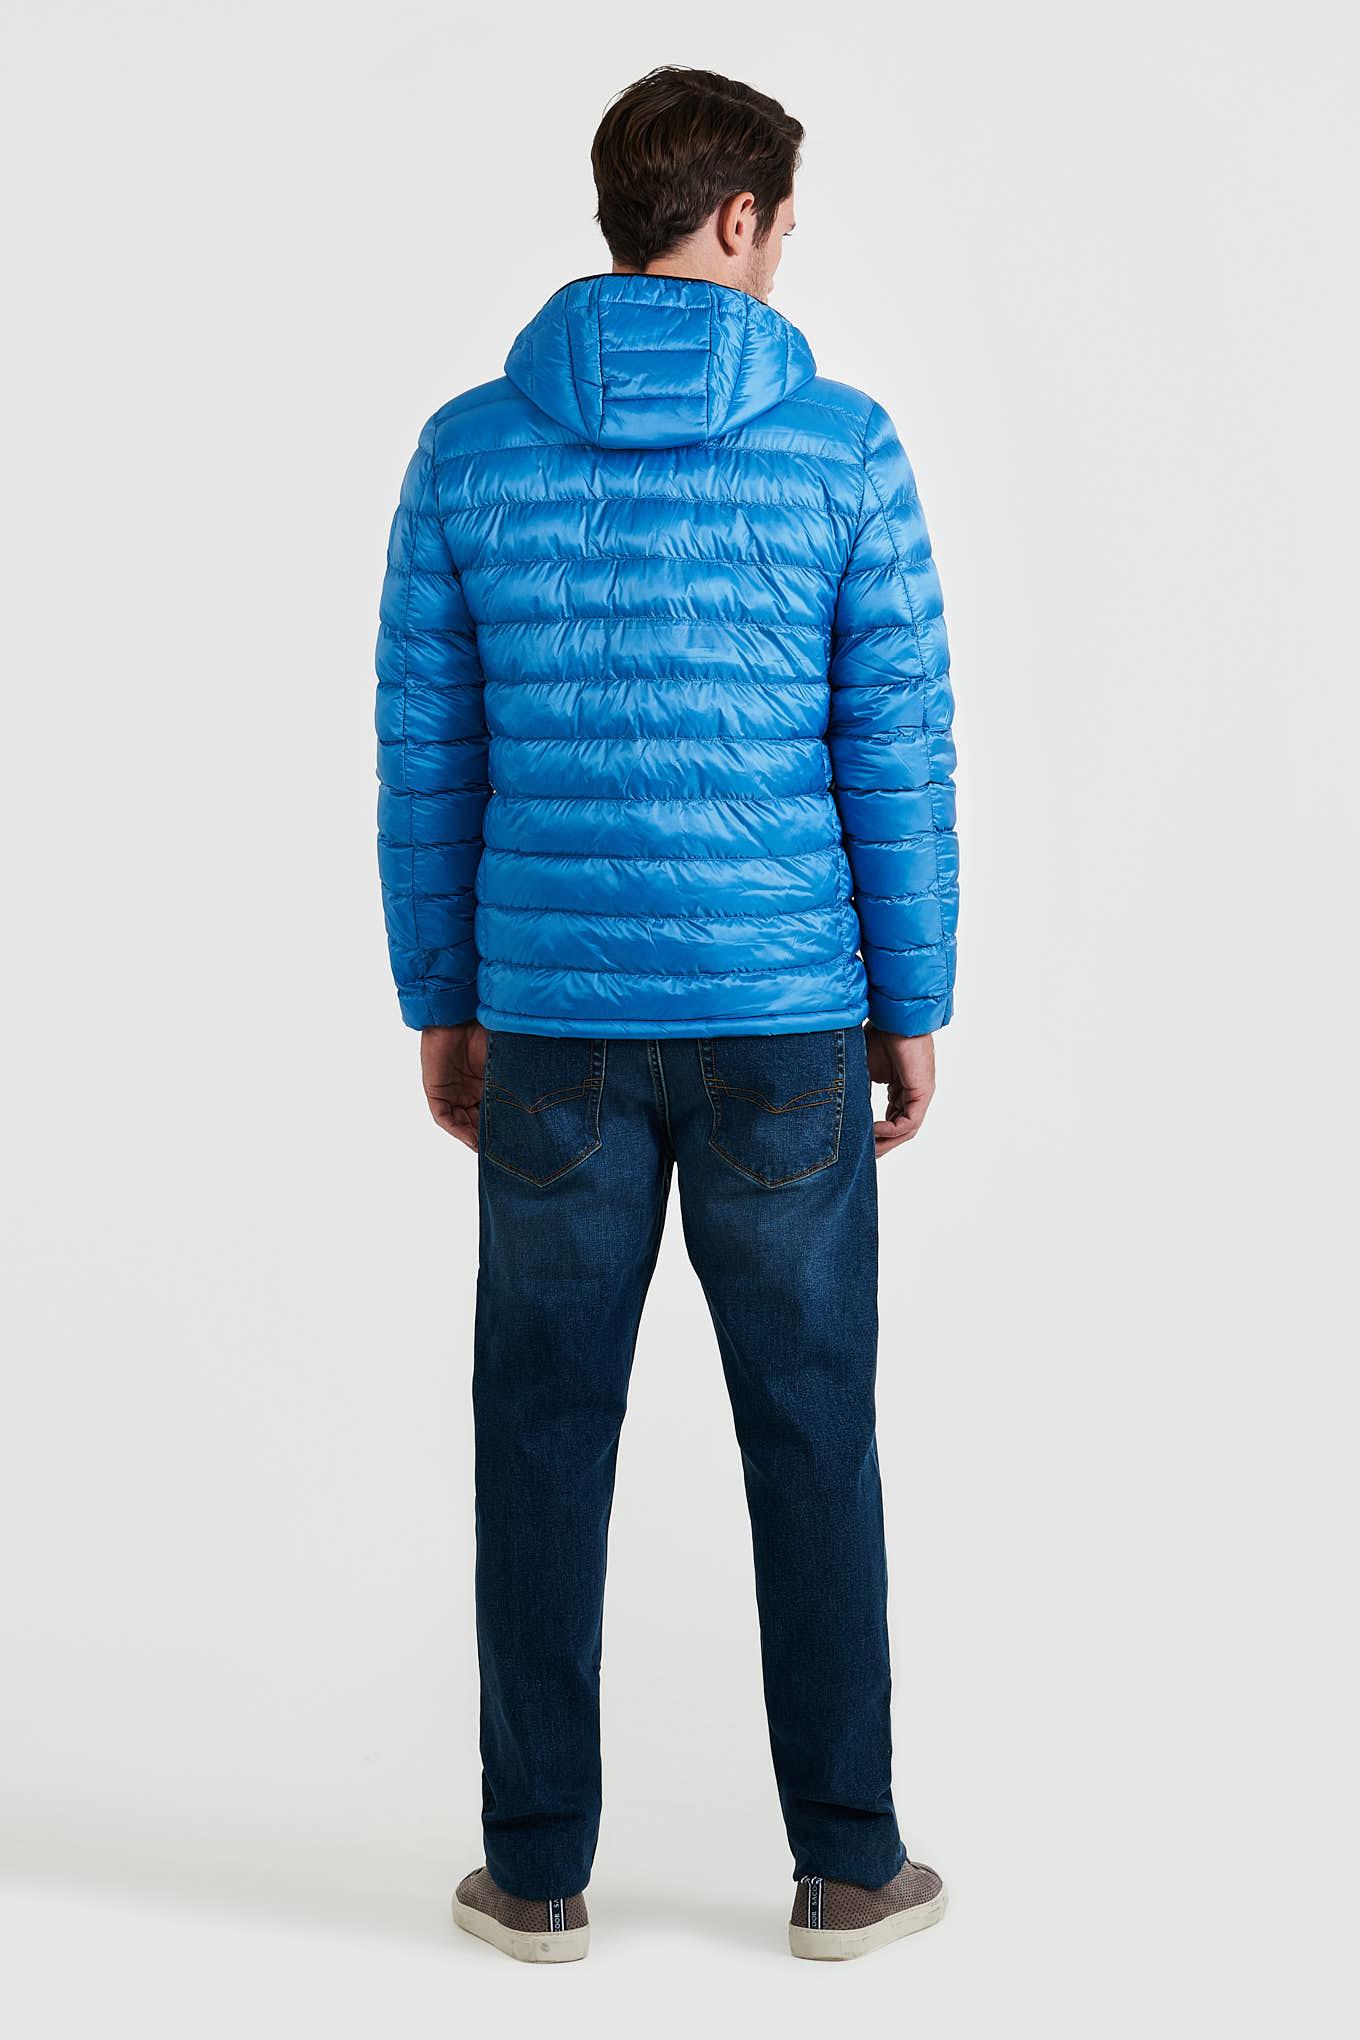 Jacket Medium Blue Casual Man